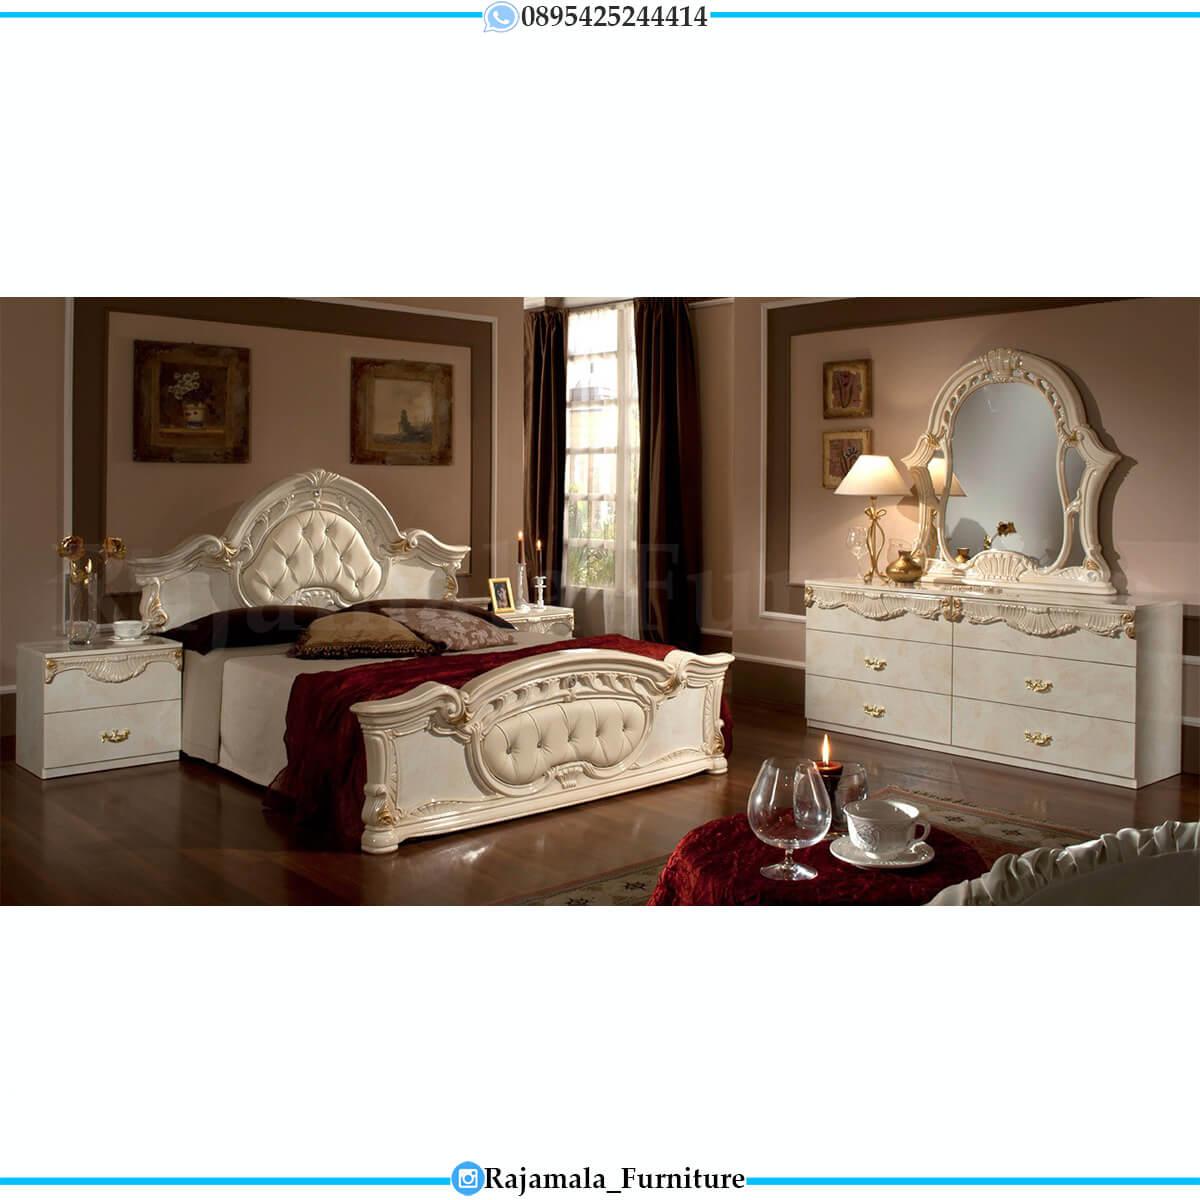 Harga Tempat Tidur Mewah Ukiran Jepara Imperial Style RM-0699